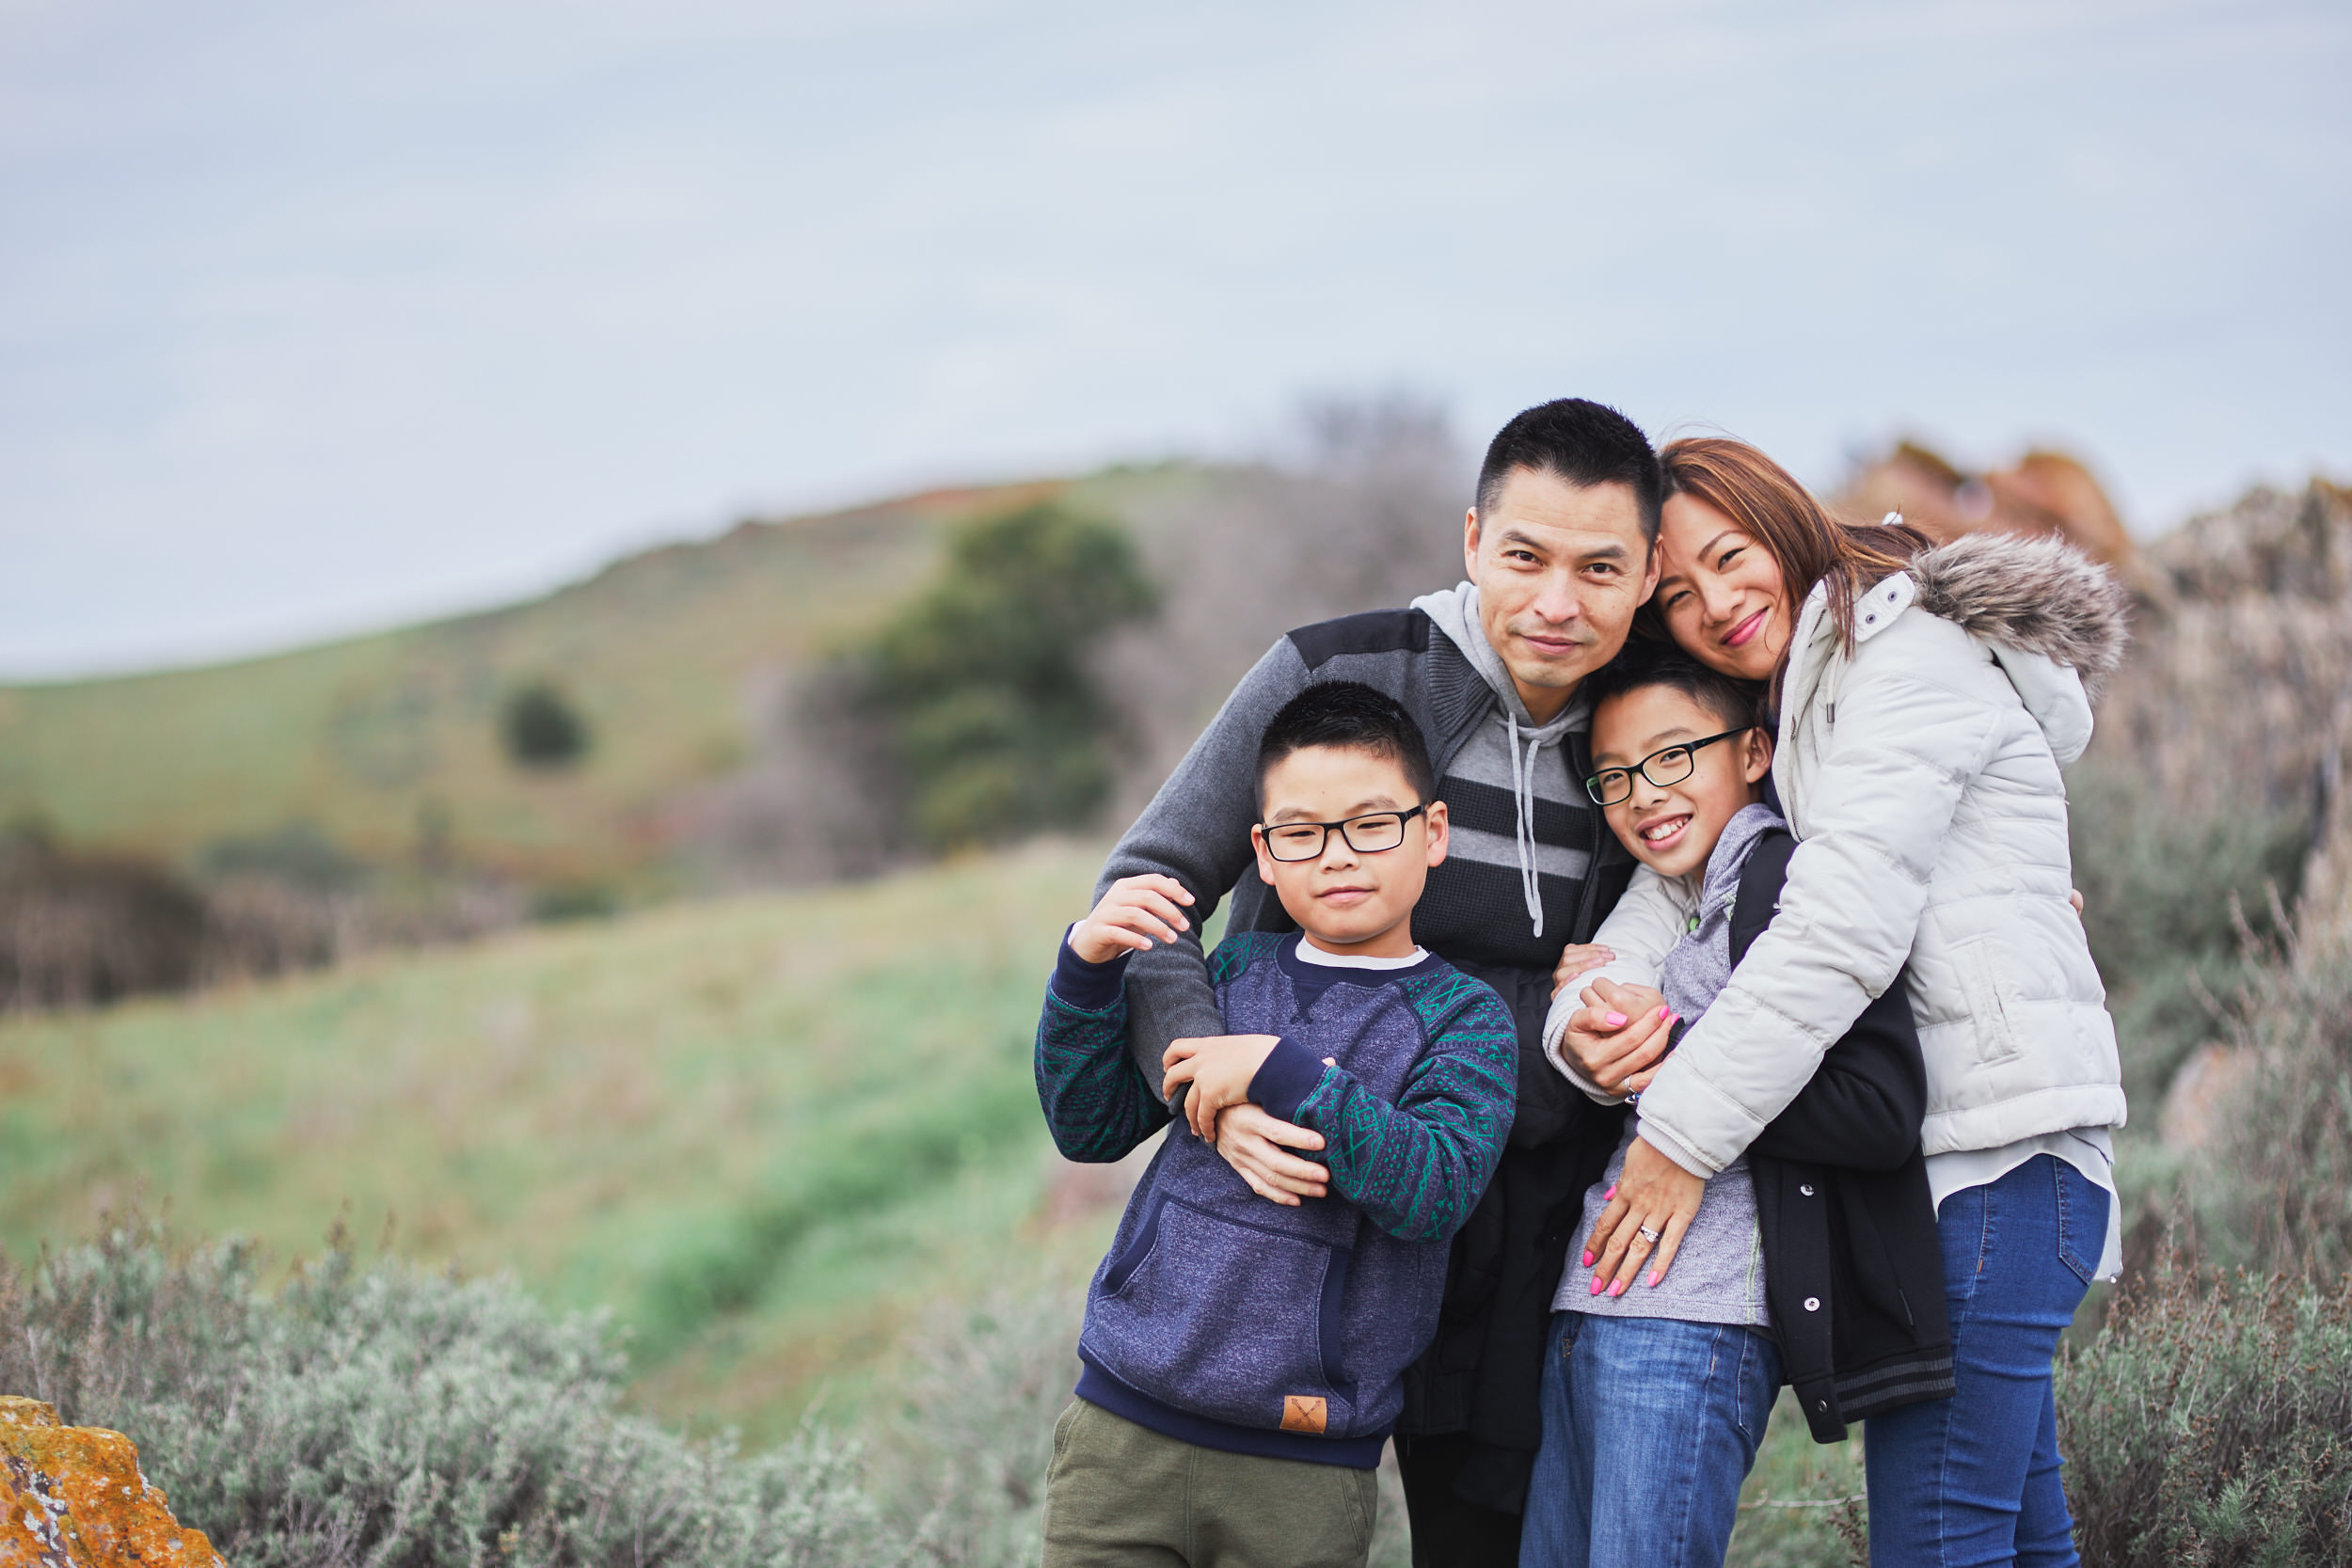 12-11-16_0524_chan_family.jpg